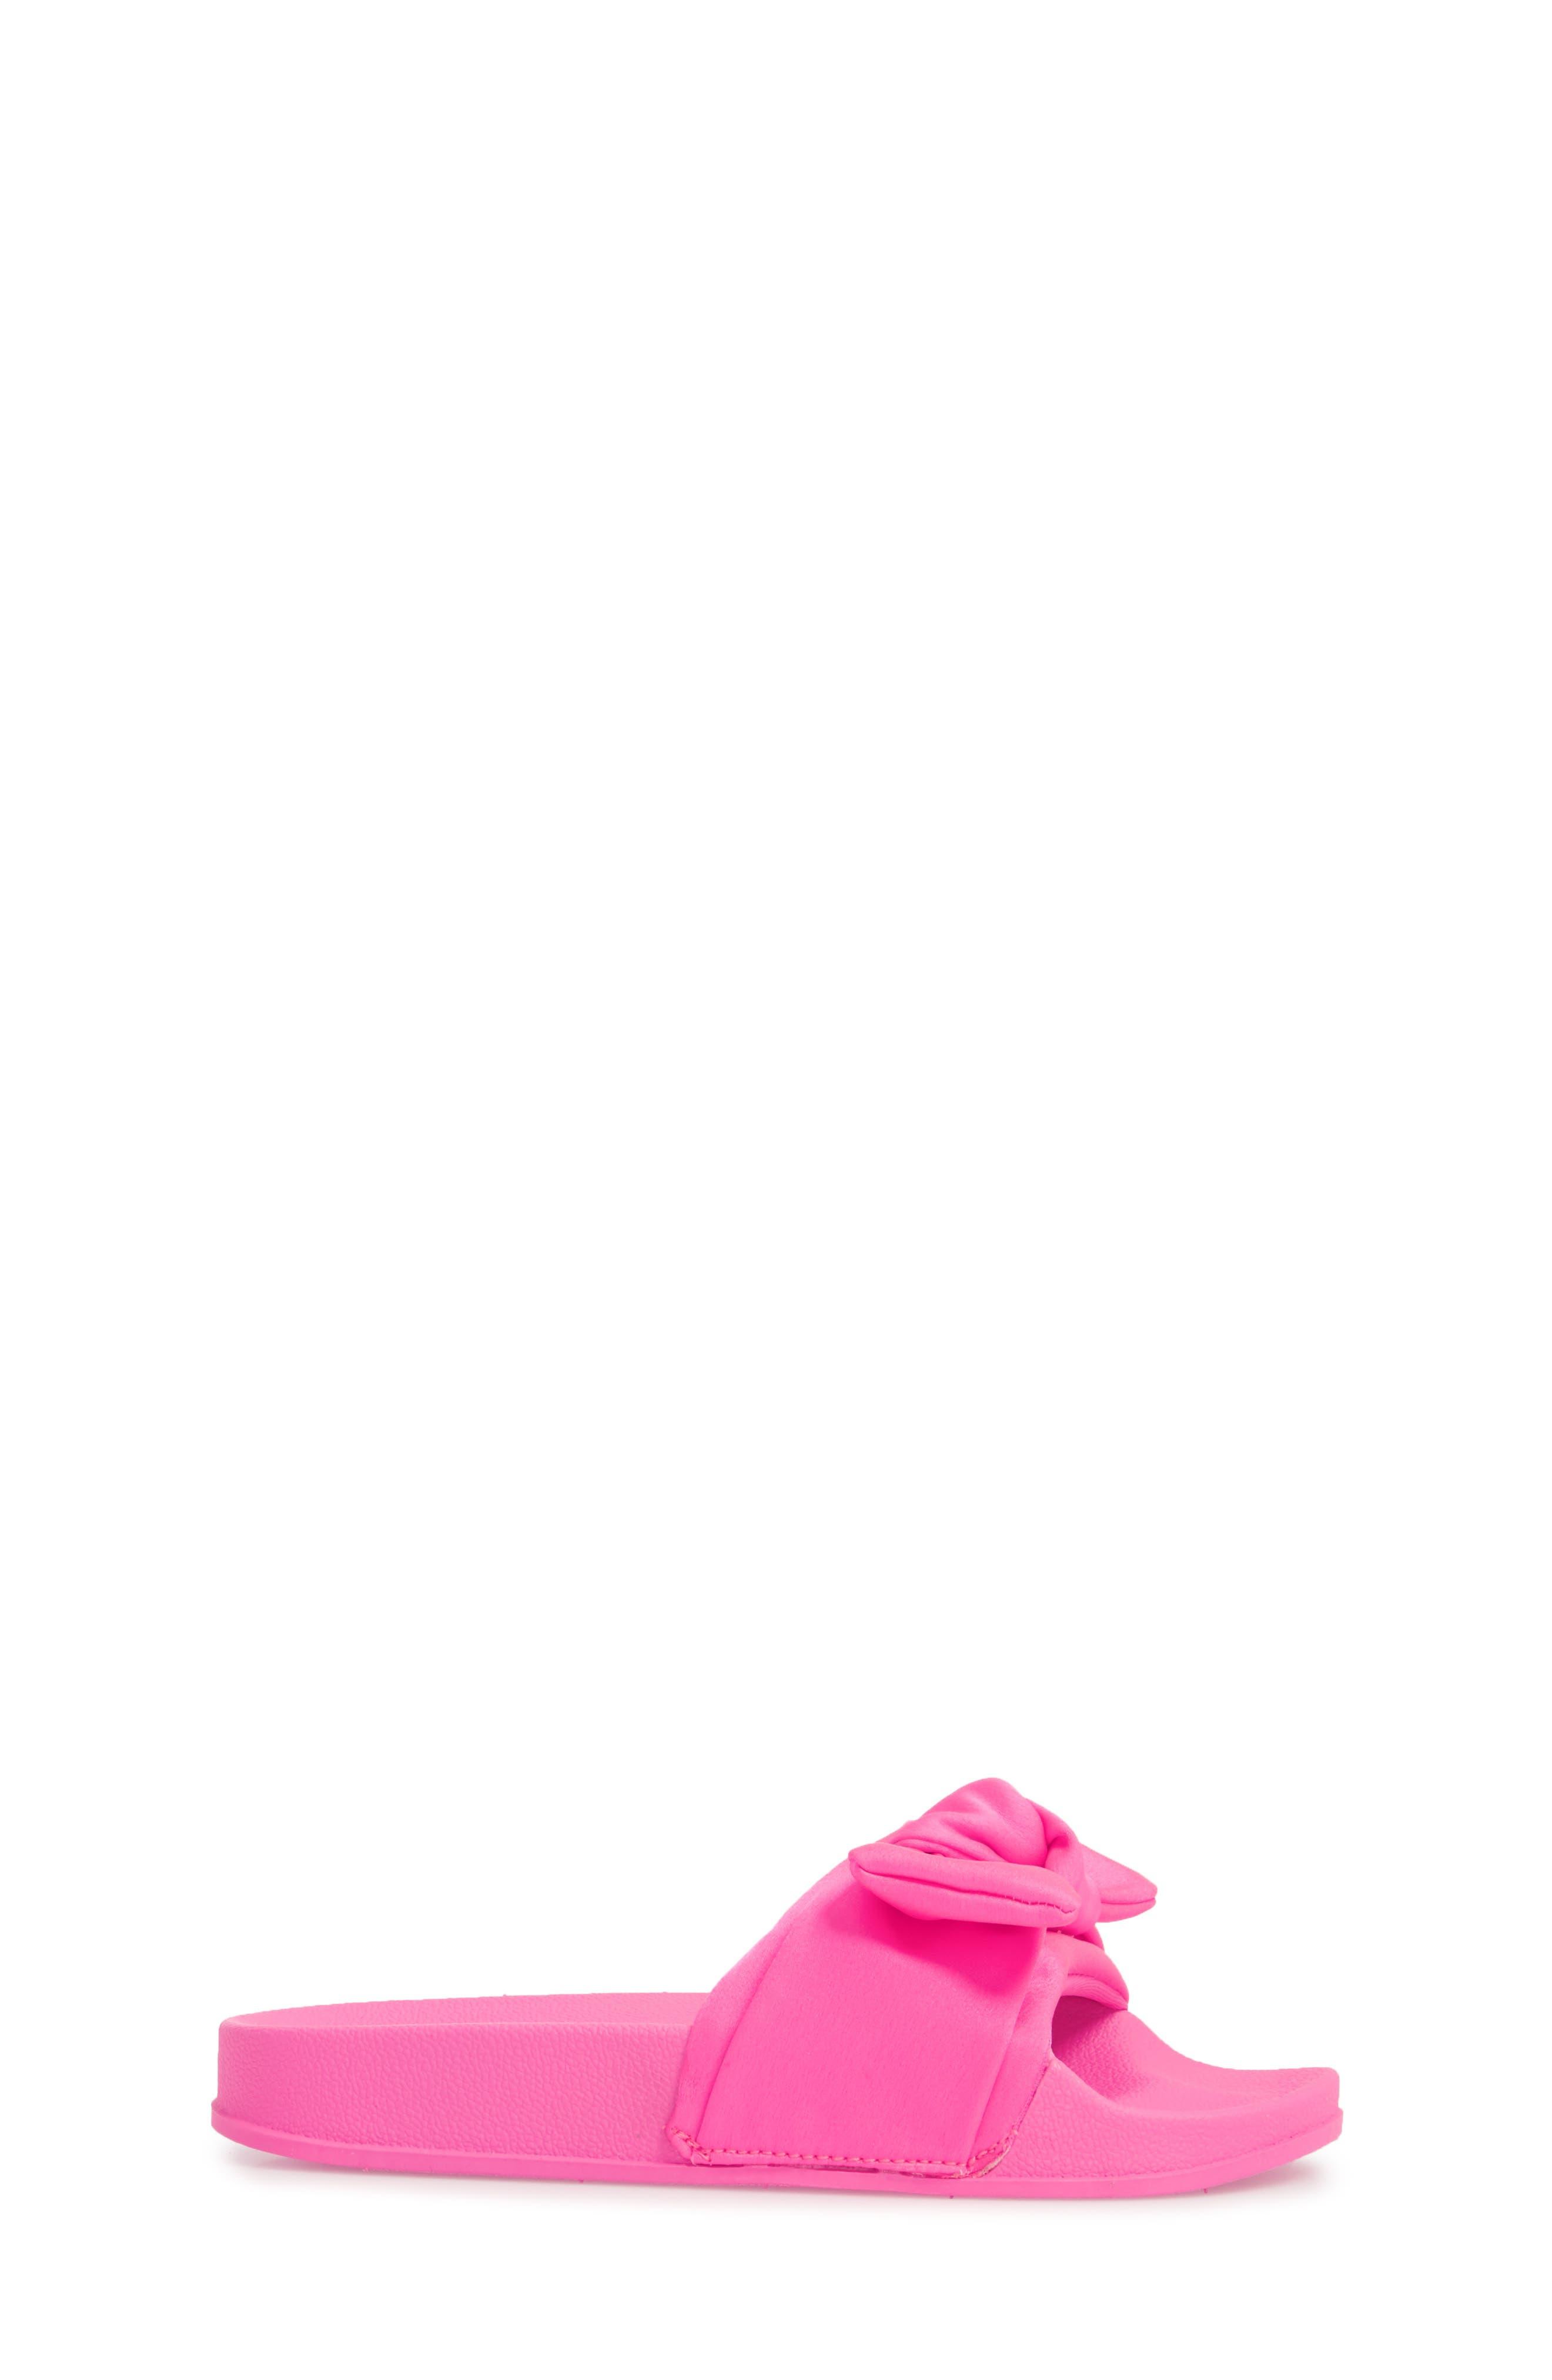 JSilky Slide Sandal,                             Alternate thumbnail 3, color,                             Hot Pink